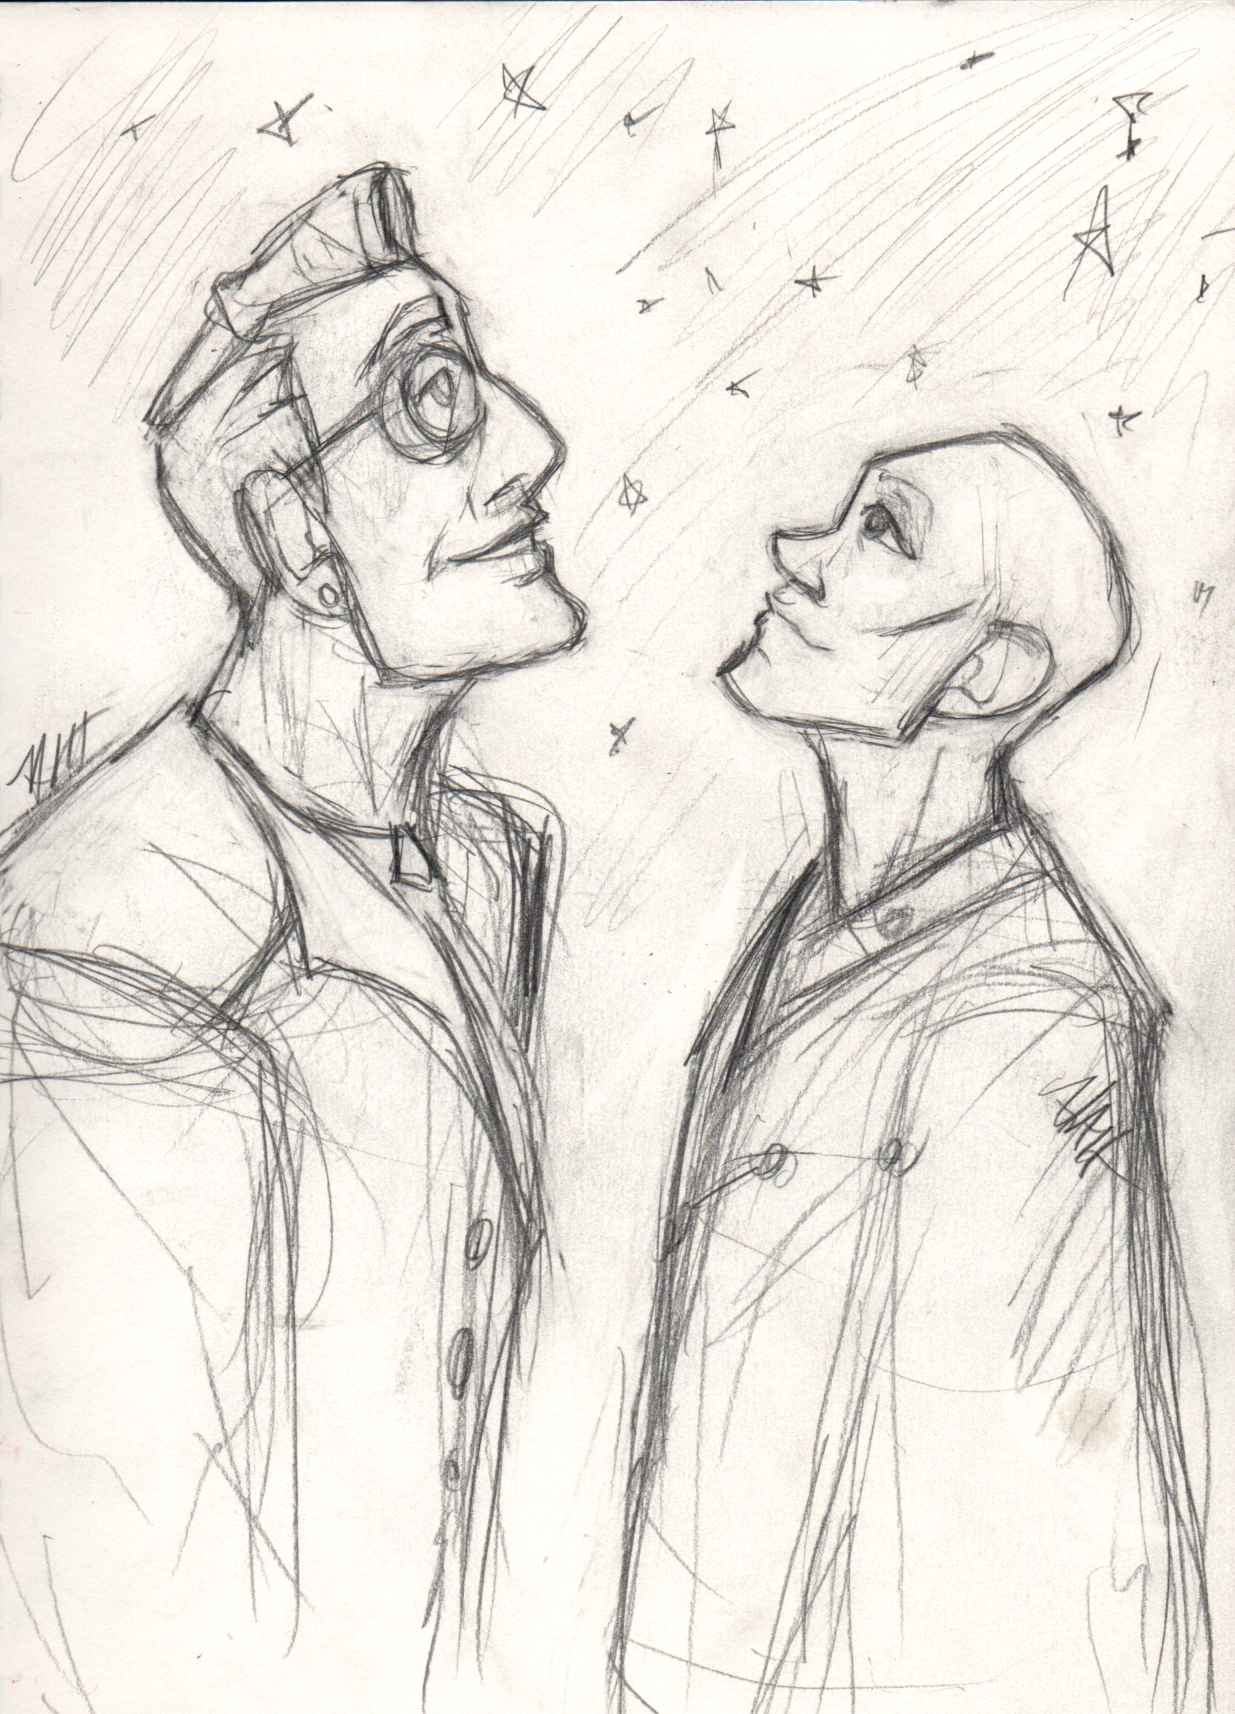 Juniper and Bay Sketchbook page